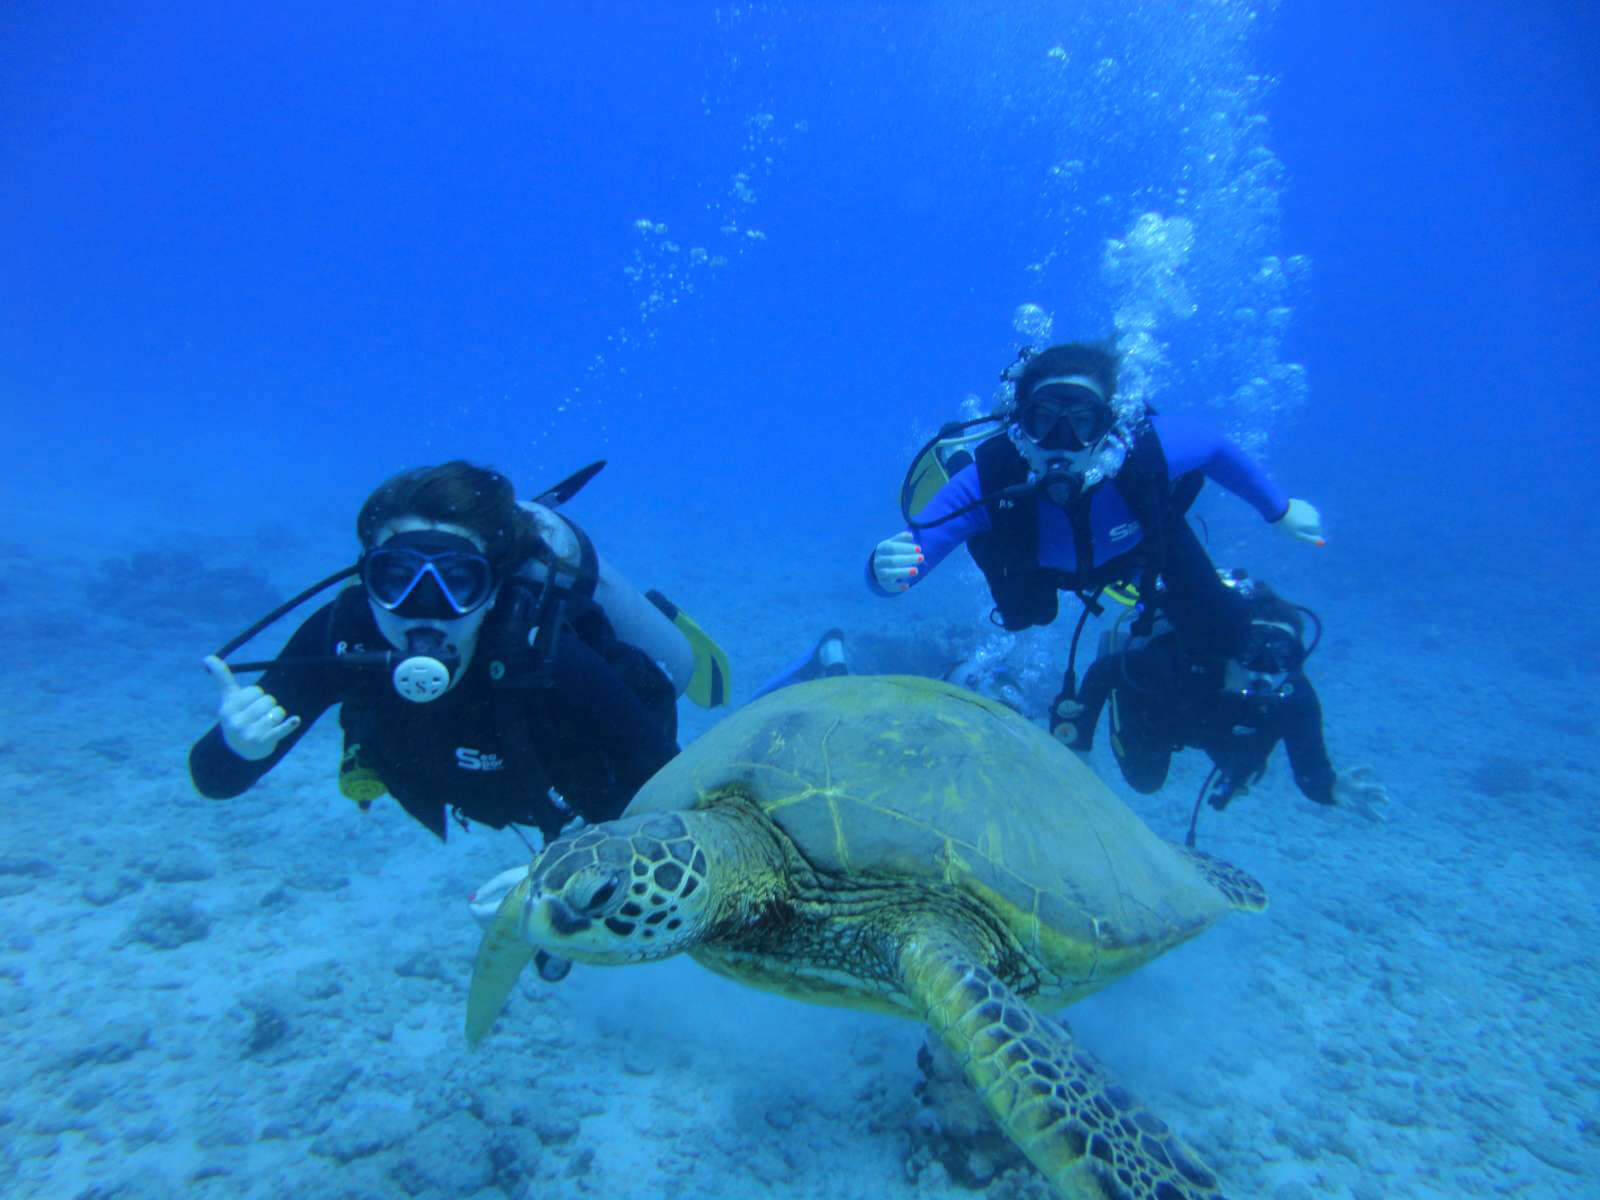 Hawaii Scuba Diving, PADI Certification, Honolulu Scuba